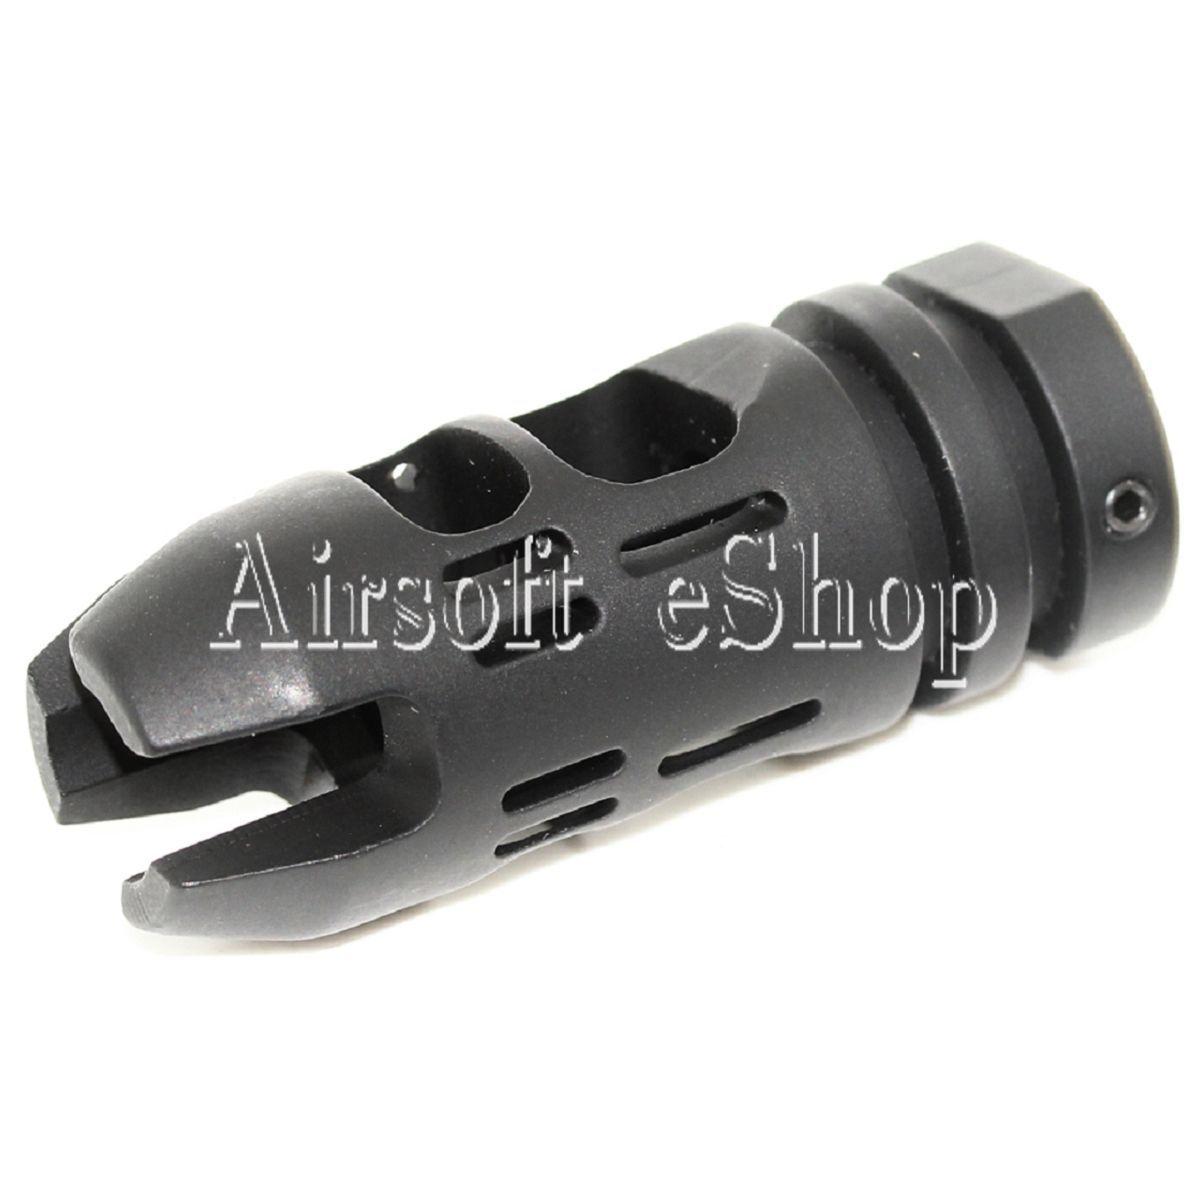 AirsoftMega APS EMG Falkor Defense VG6 Epsilon Muzzle Brake FlashHider -14mm